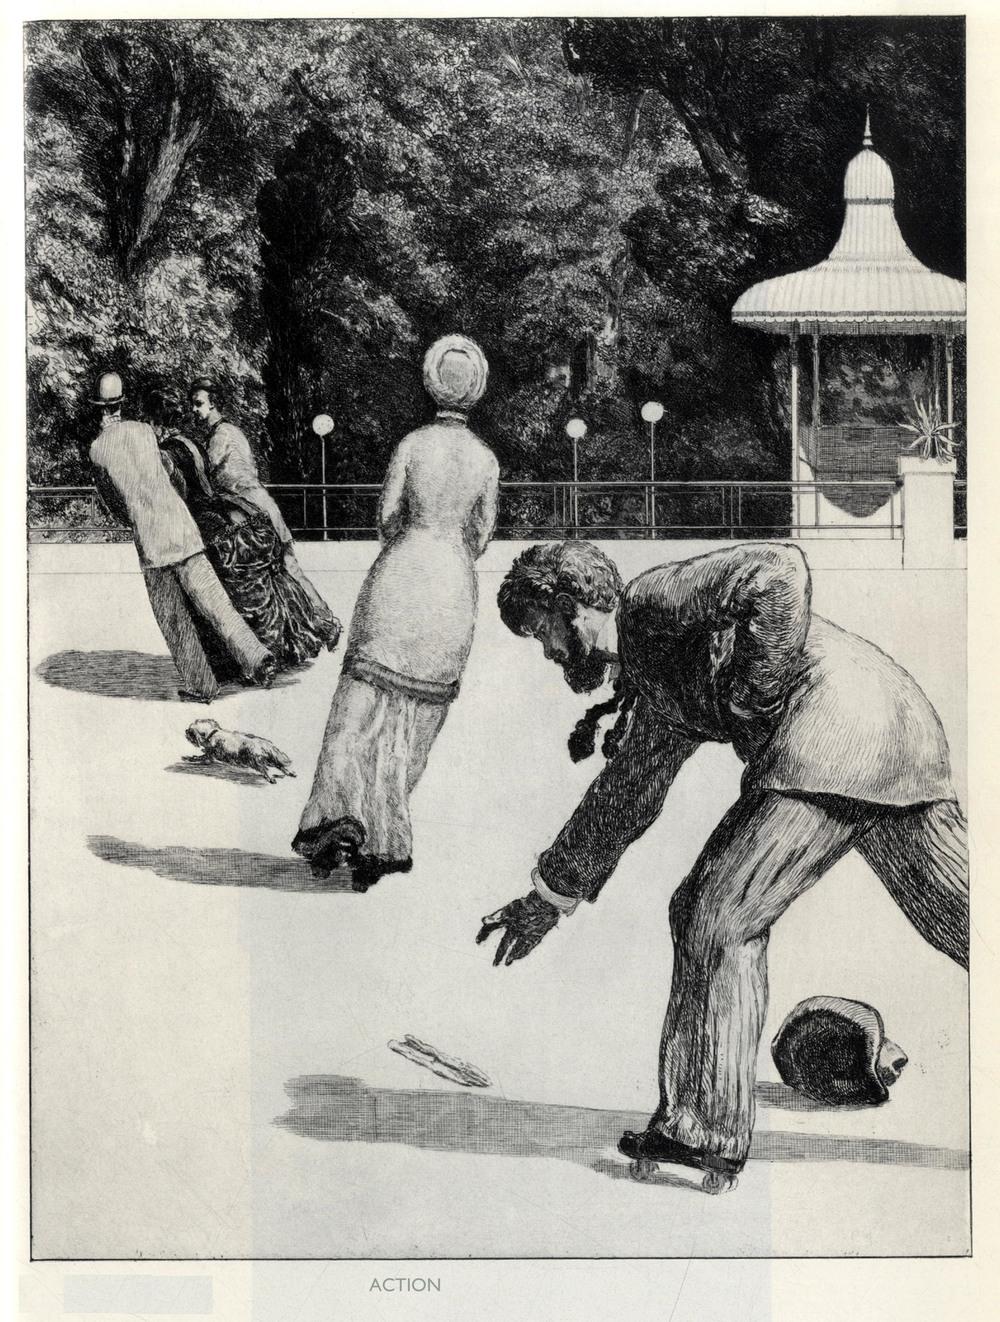 Max Klinger,  A Glove:  Action , 1881.